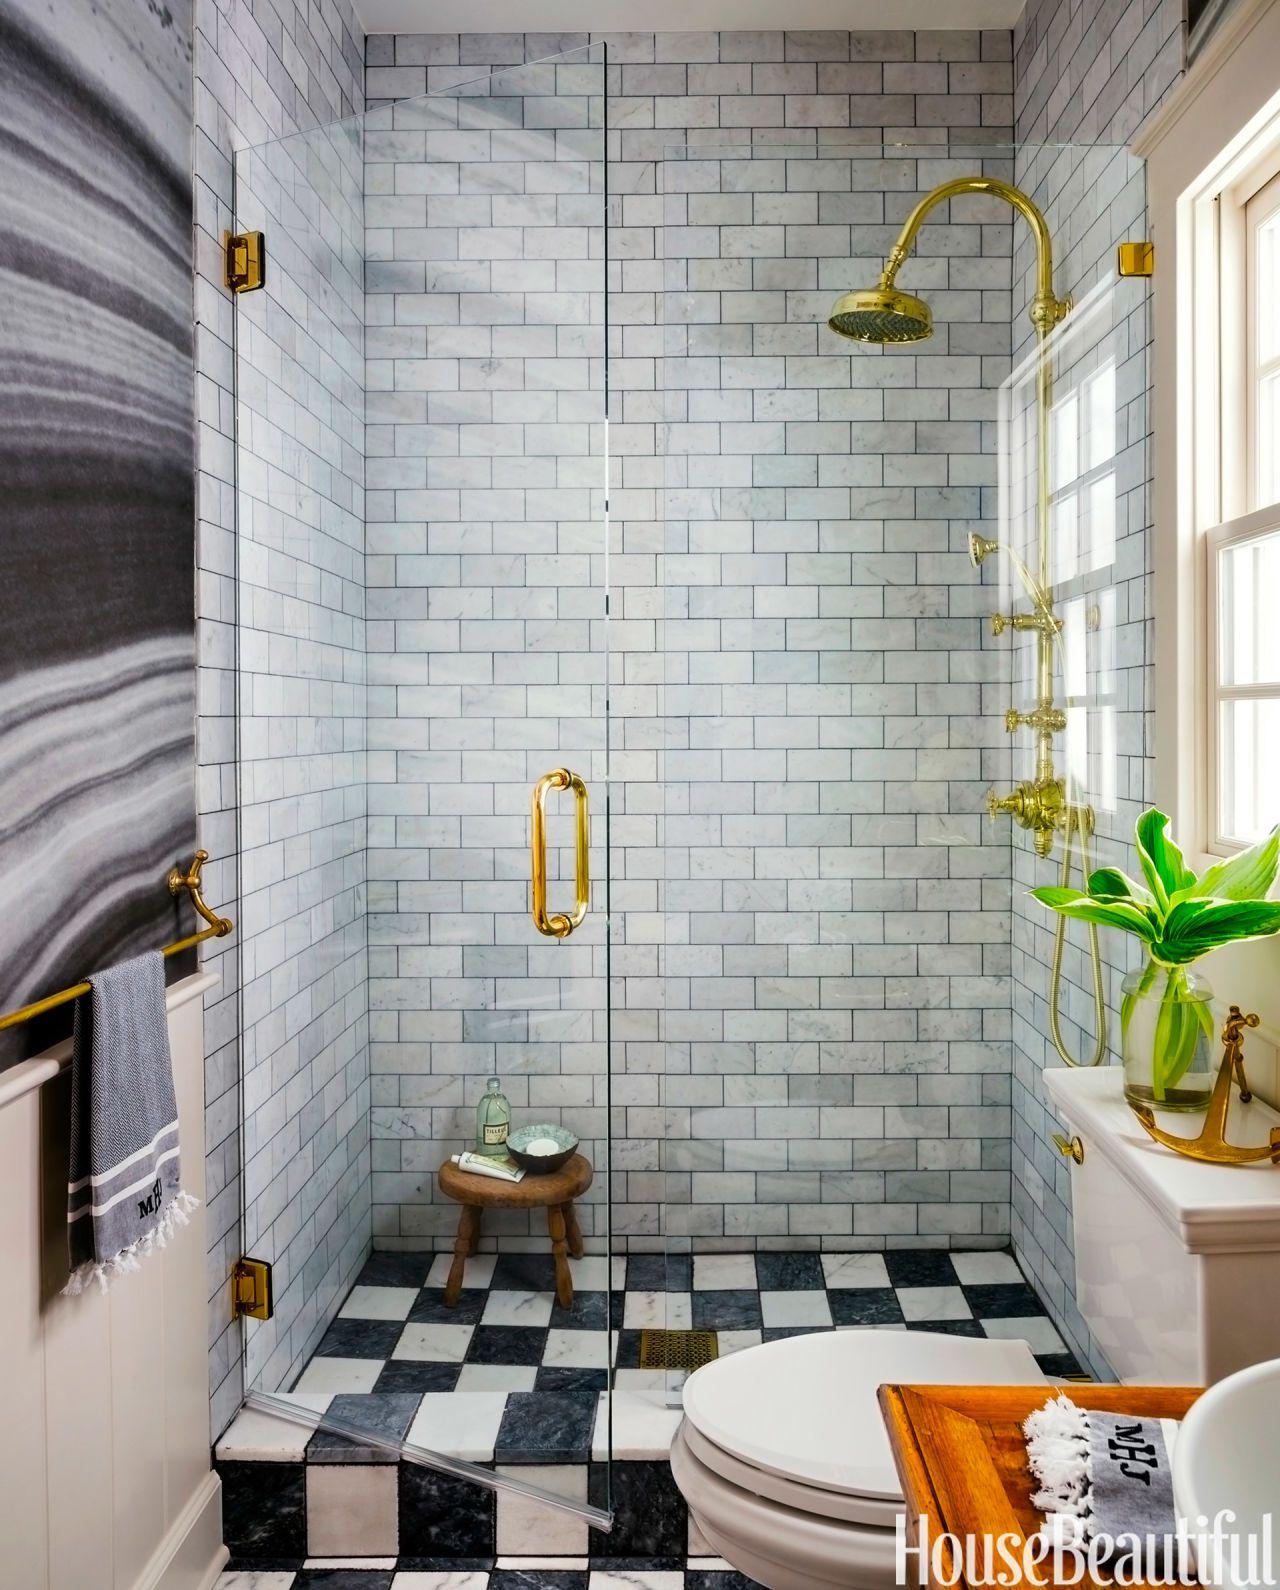 25 small bathroom design ideas - small bathroom solutions RJDIOWK